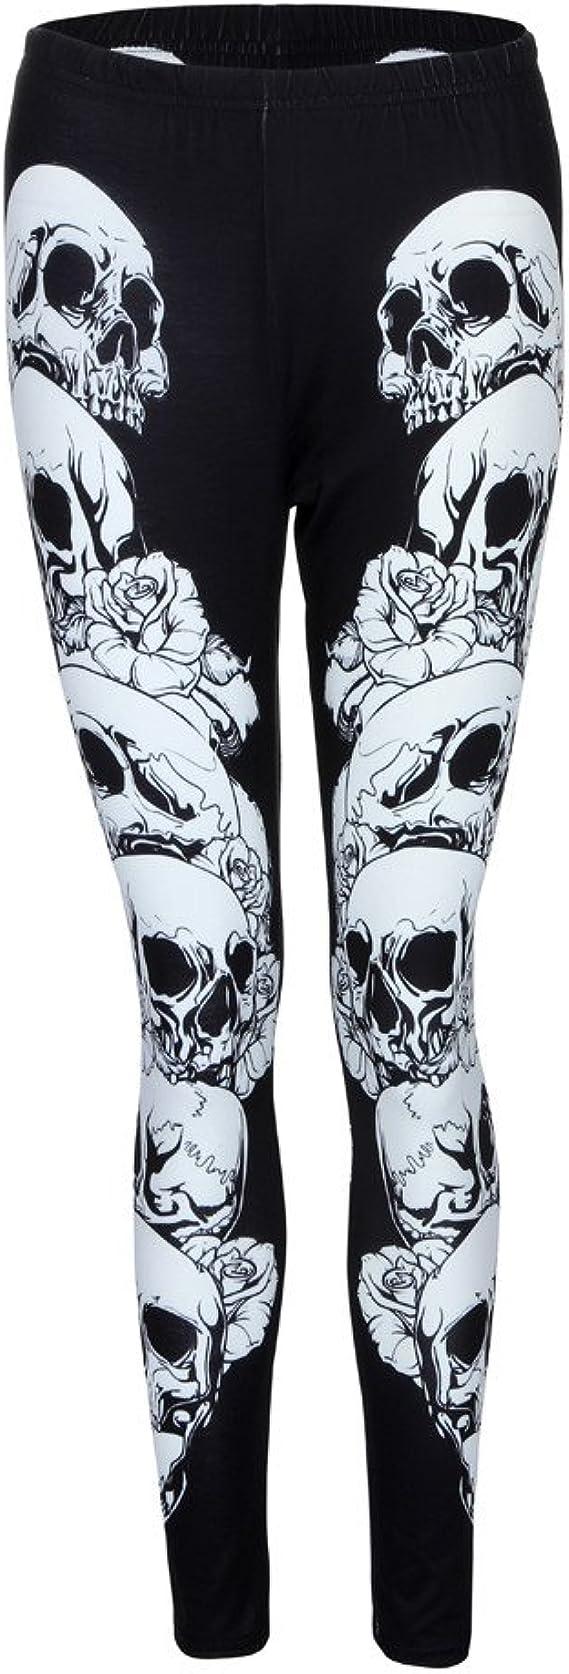 Skull Bone Womens Power Flex Yoga Shorts Dance Athletic Sport Hot Shorts